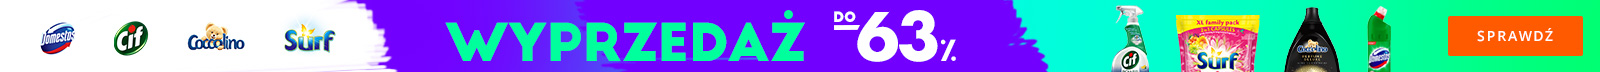 90 06 08 20 hc multicategory multibrand multiproduct th desktop 1600x72 trafnosc multi retailer fioletowozielona